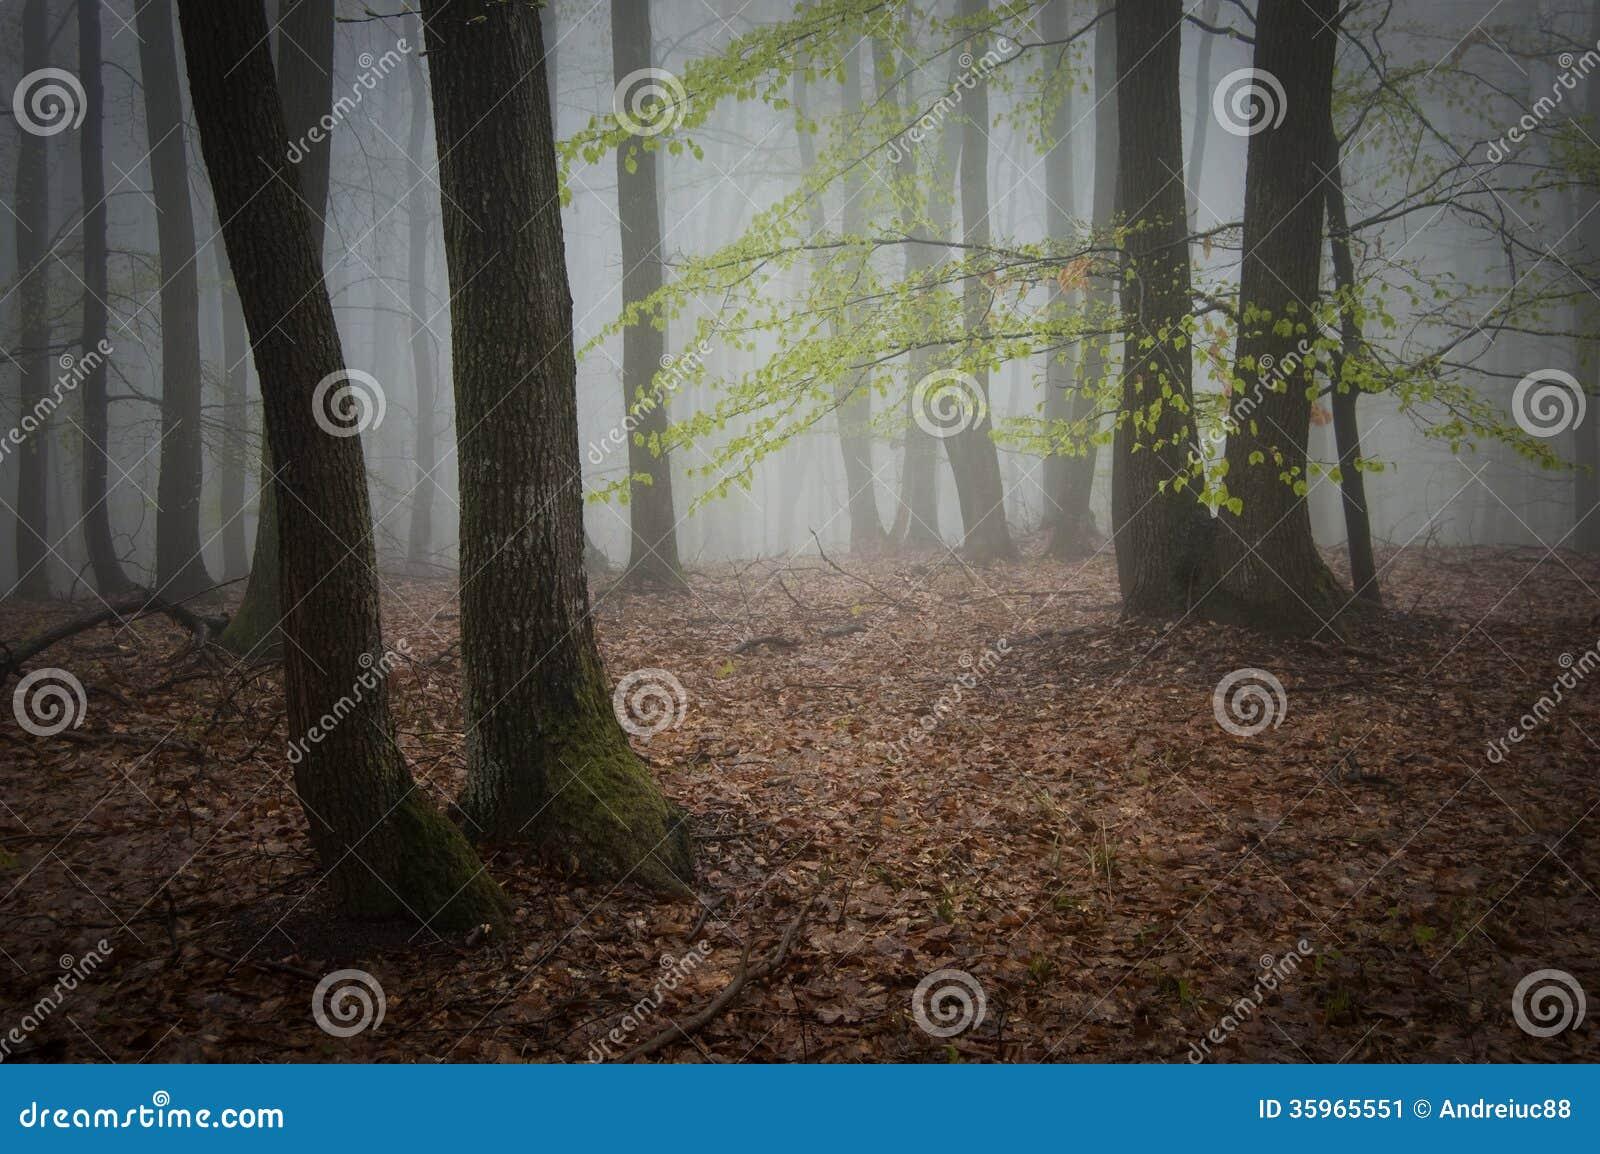 Empáñese en un bosque después de lluvia en verano